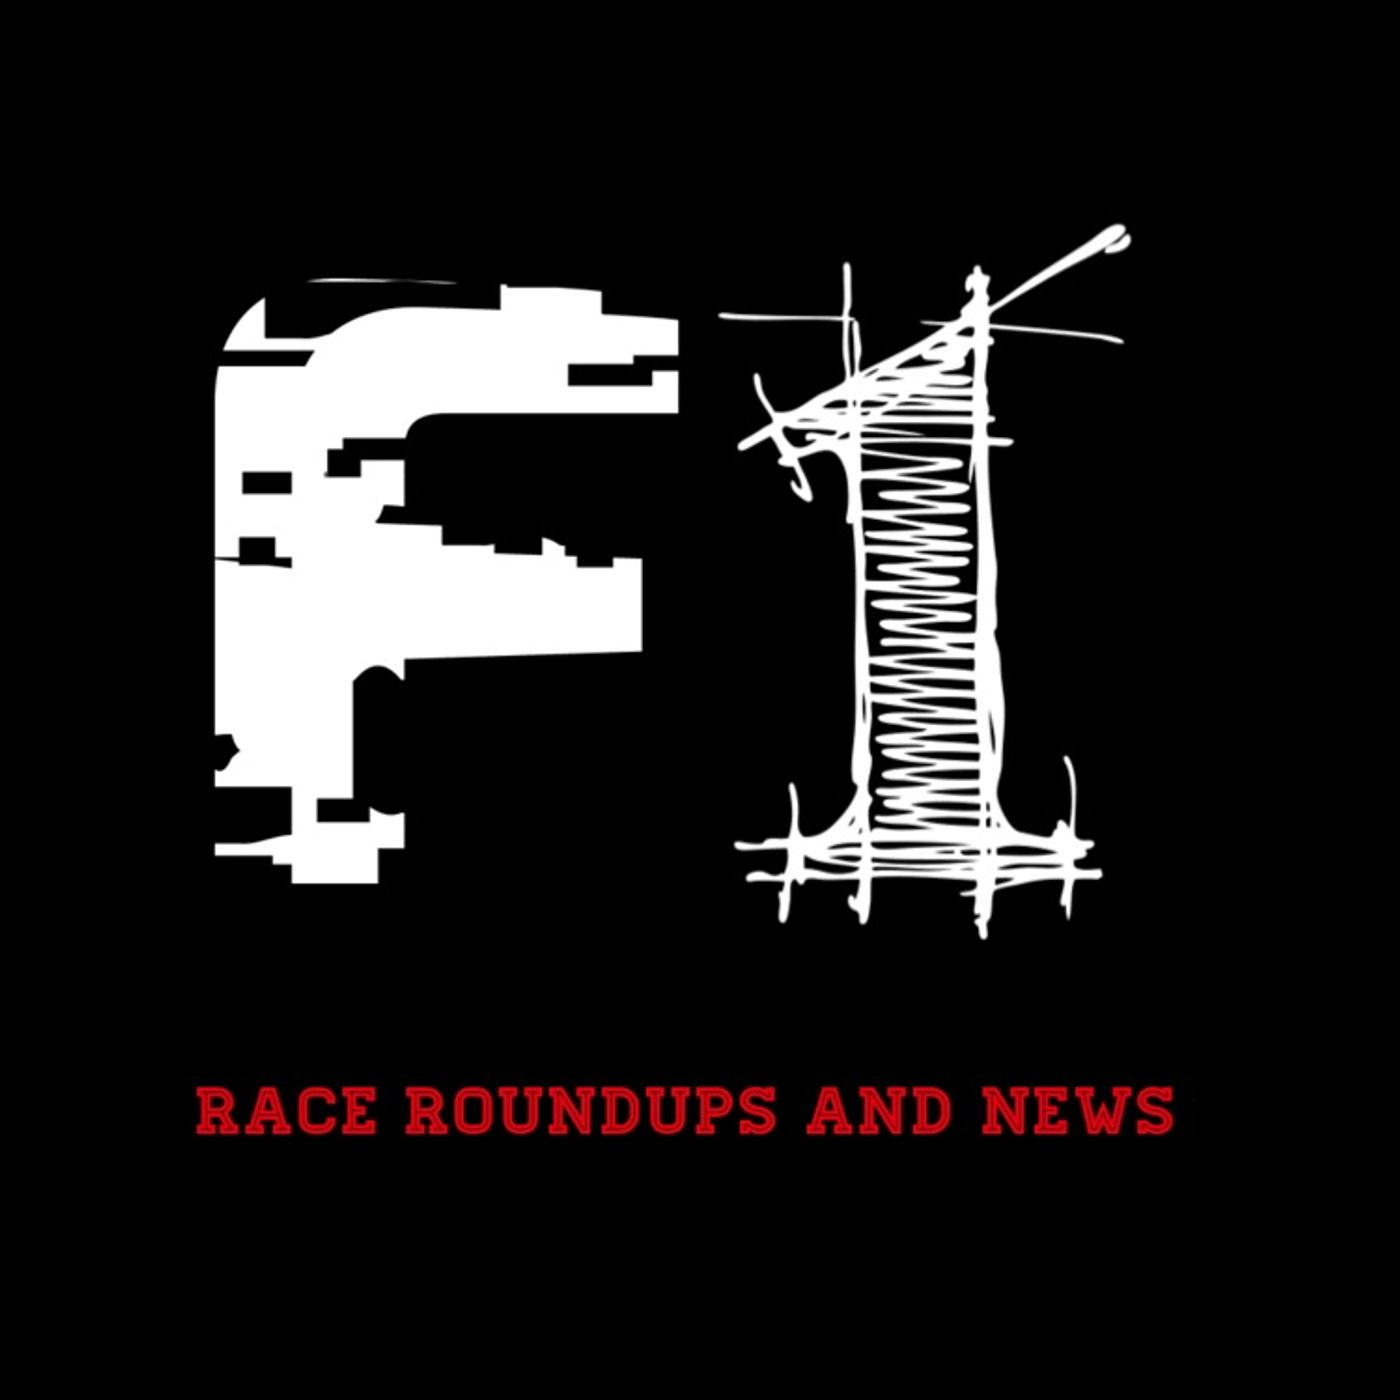 Episode 17: Mercedes, Alpine and Aston Martin Reveal 2021 Challengers